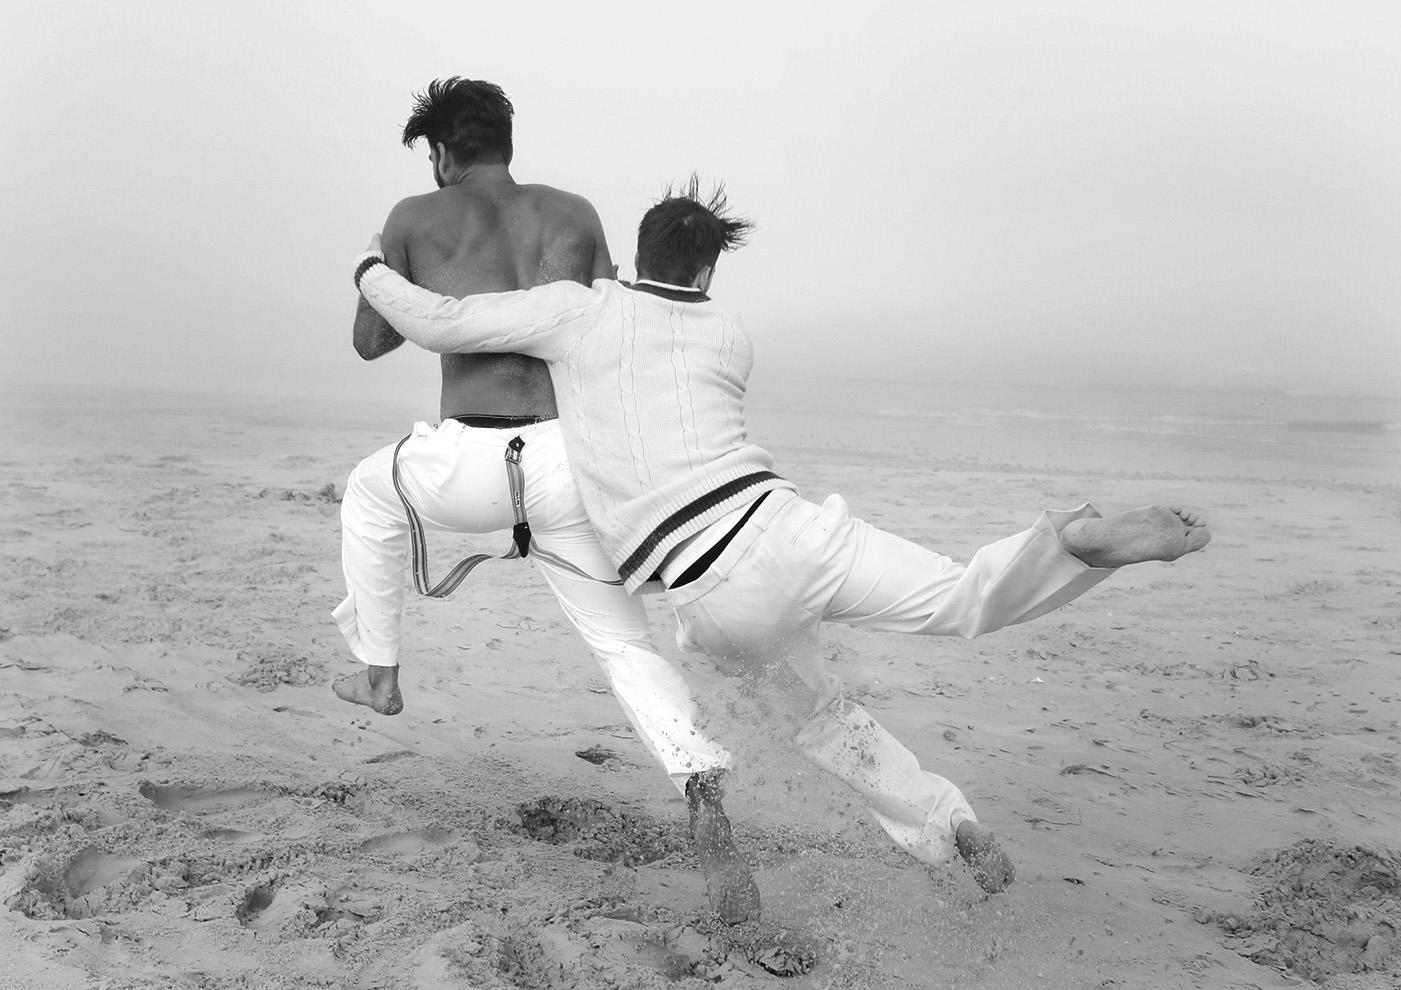 beach rugby kult magazine tackle.jpg